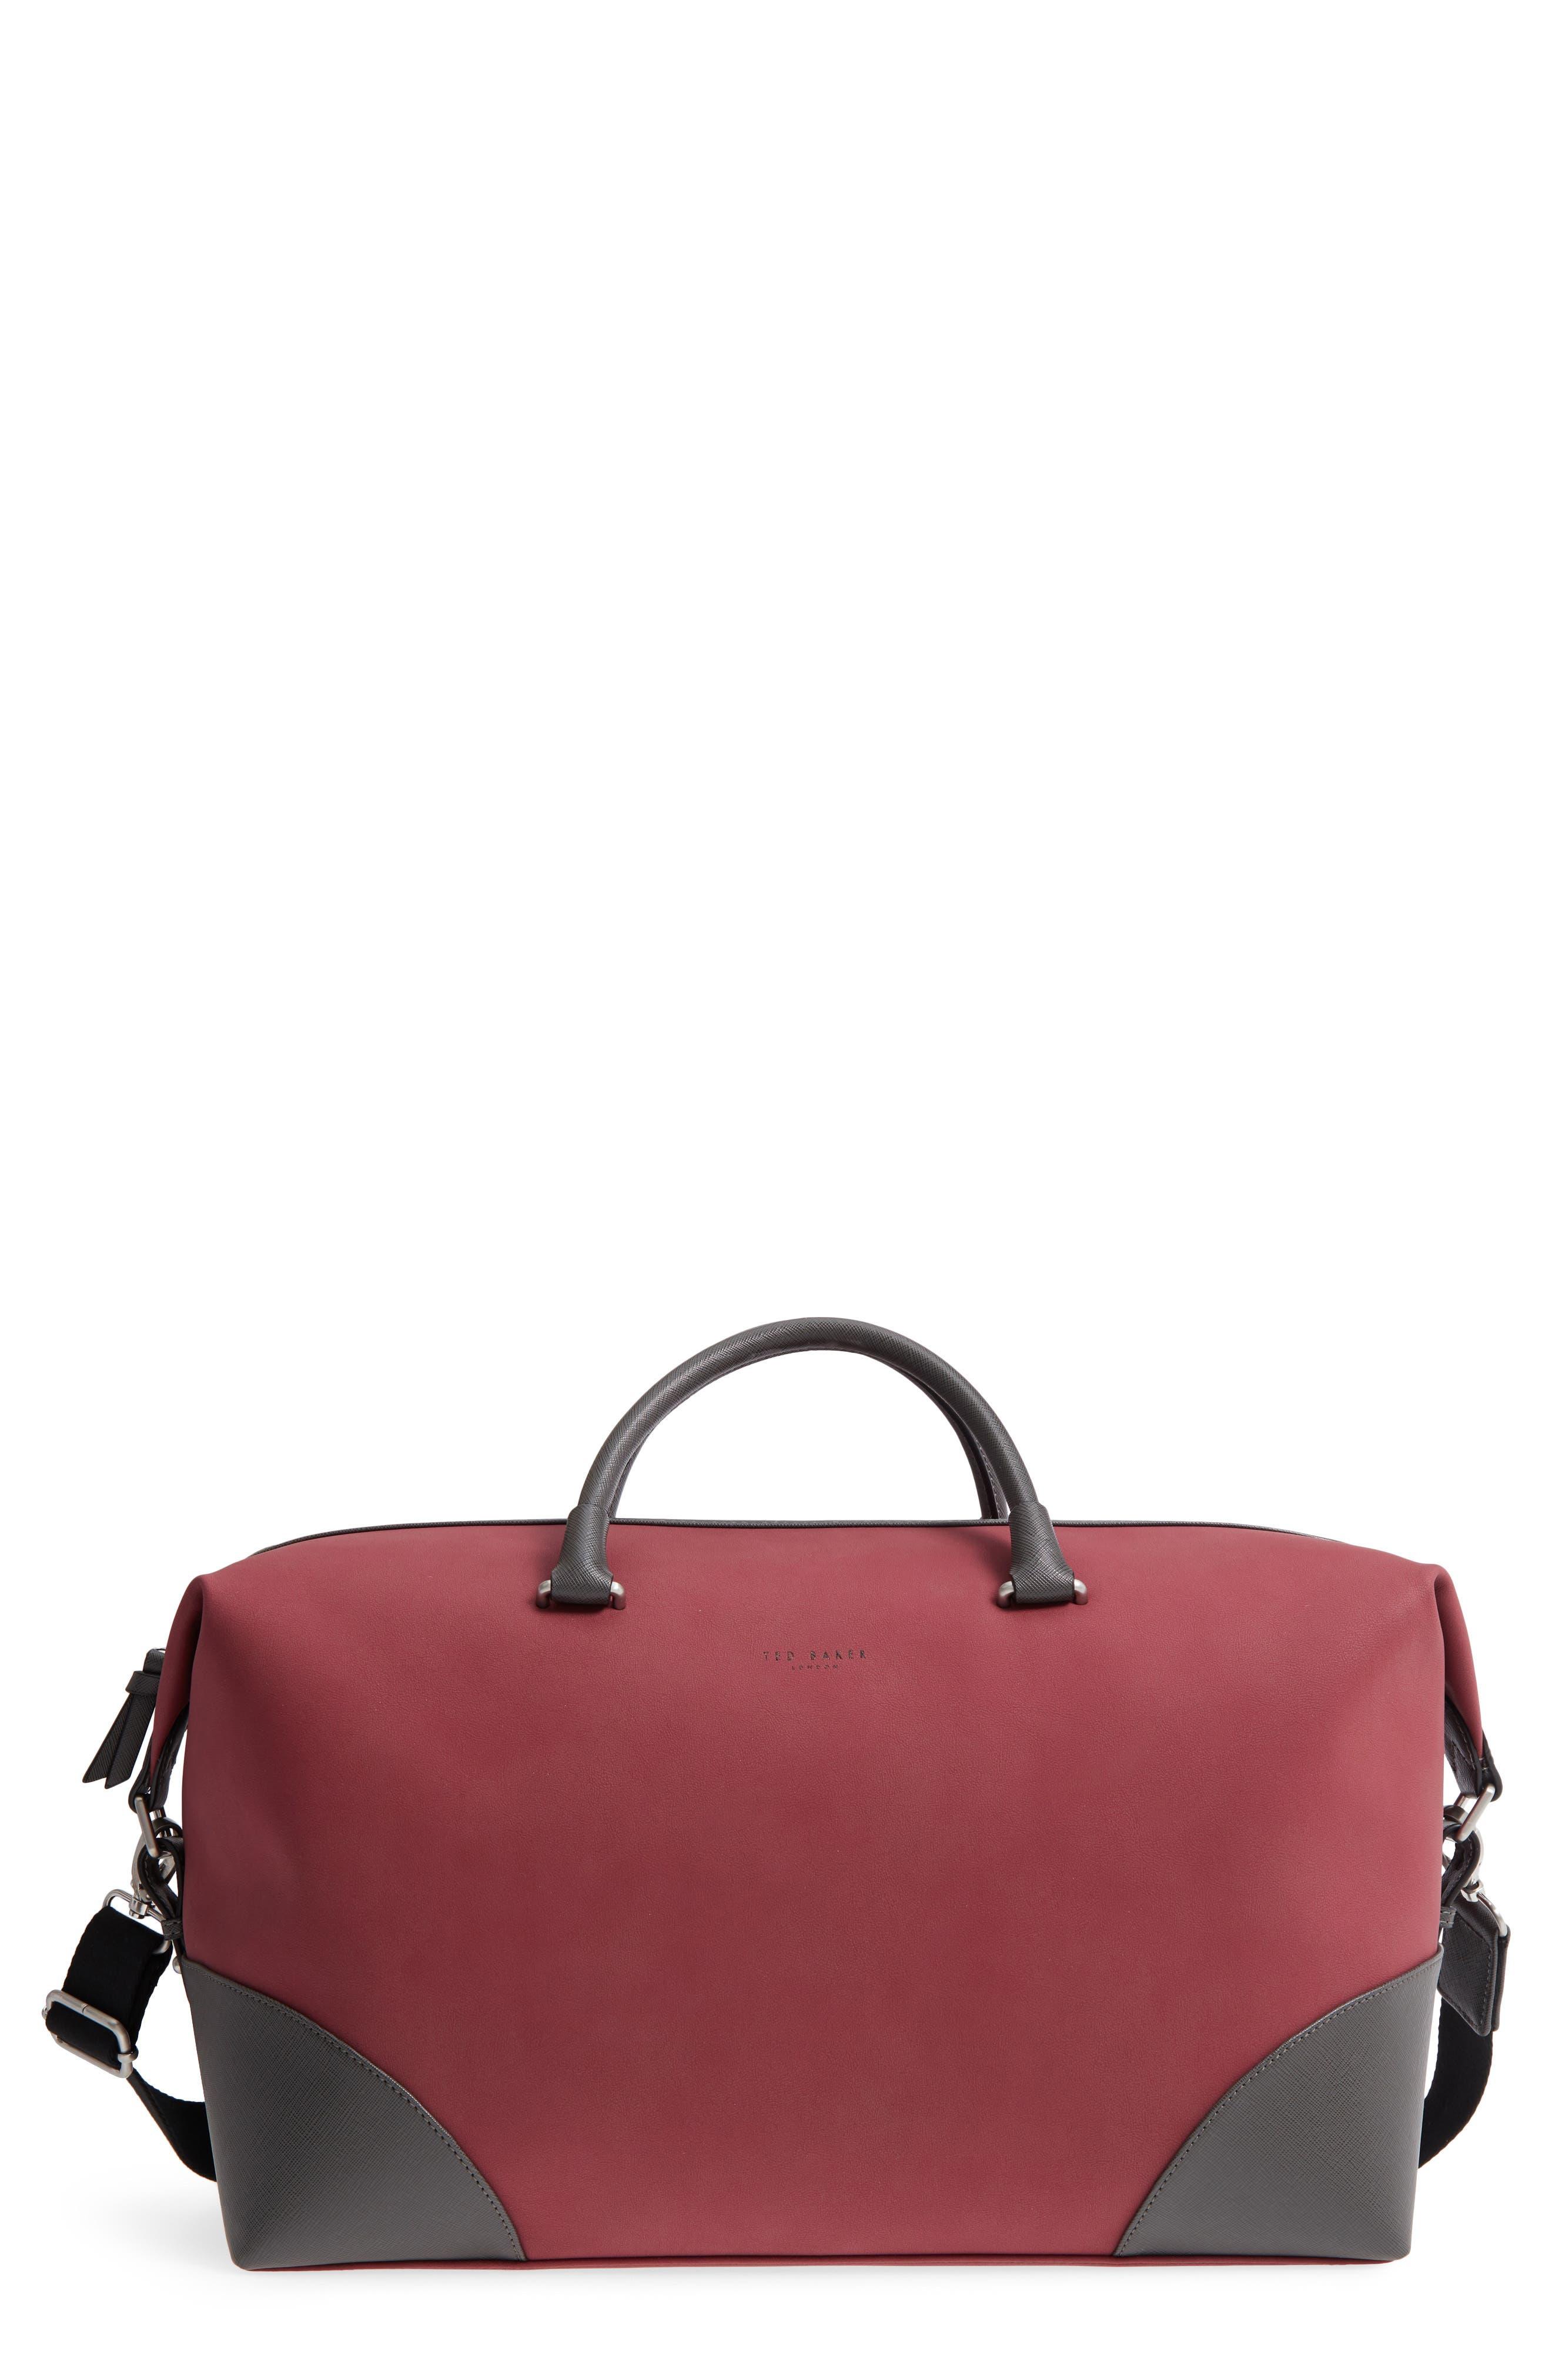 Swipes Duffel Bag,                             Main thumbnail 1, color,                             Red